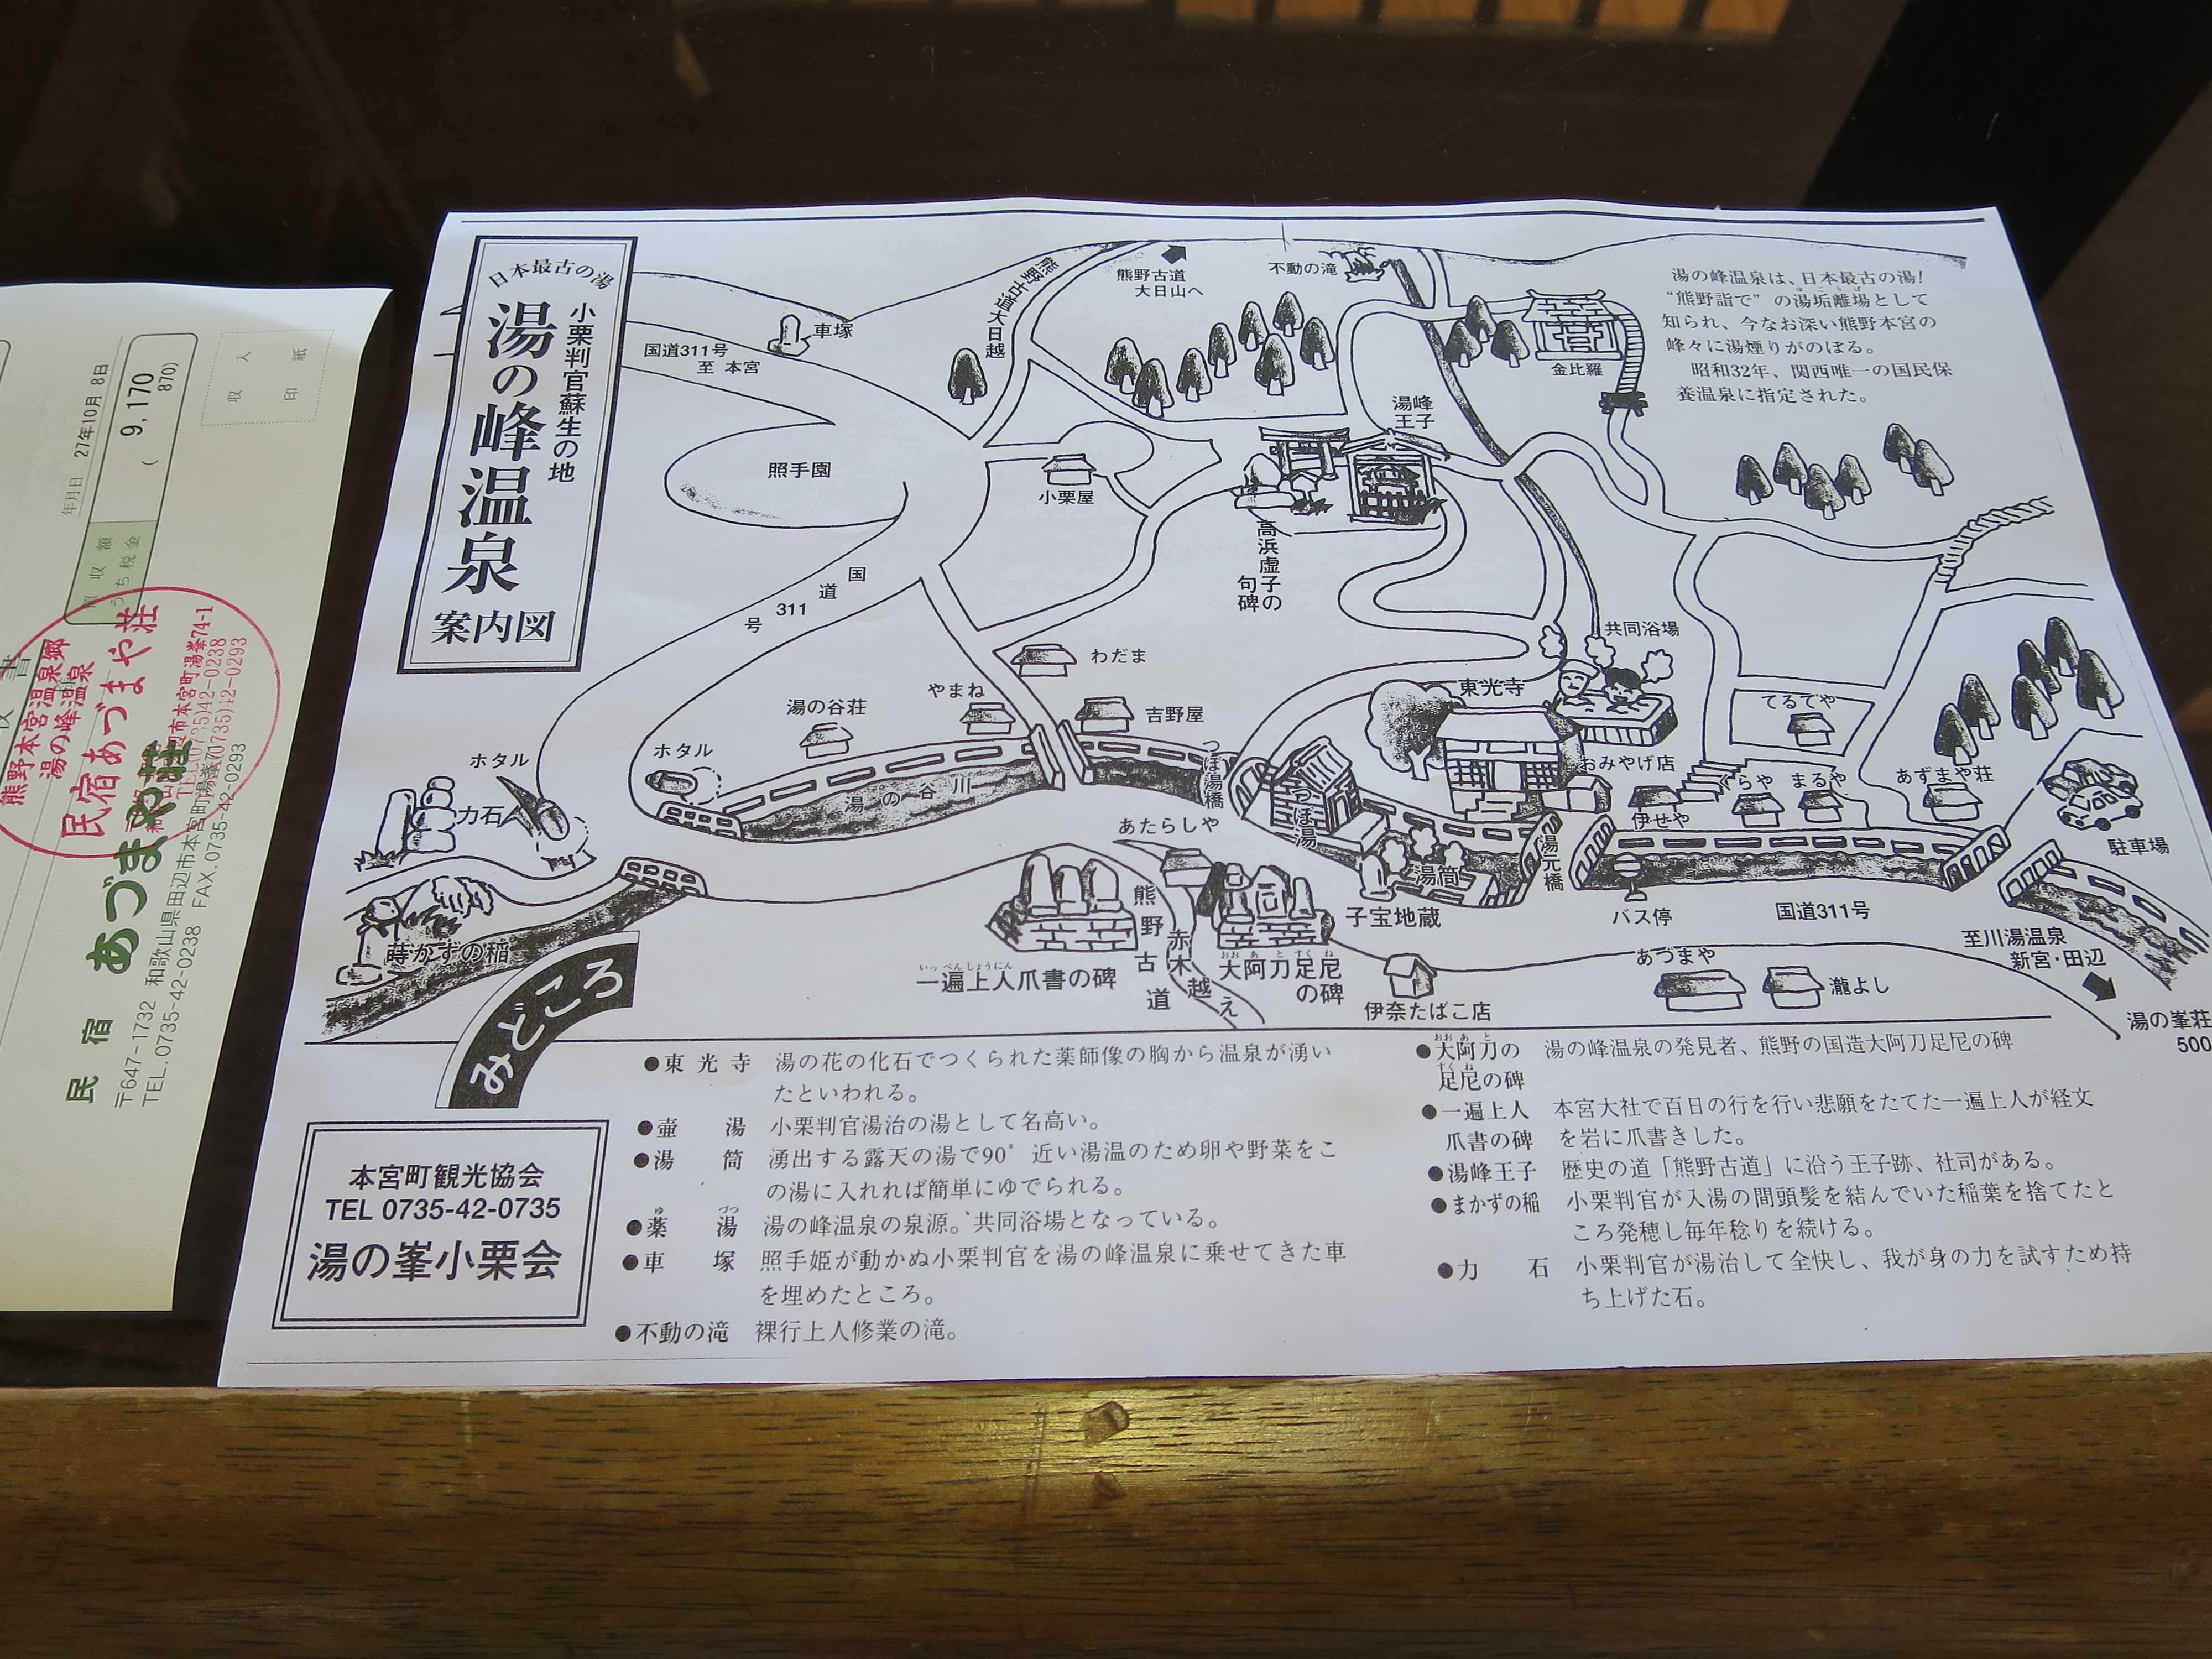 日本最古の湯 小栗判官蘇生の地 湯の峰温泉案内図